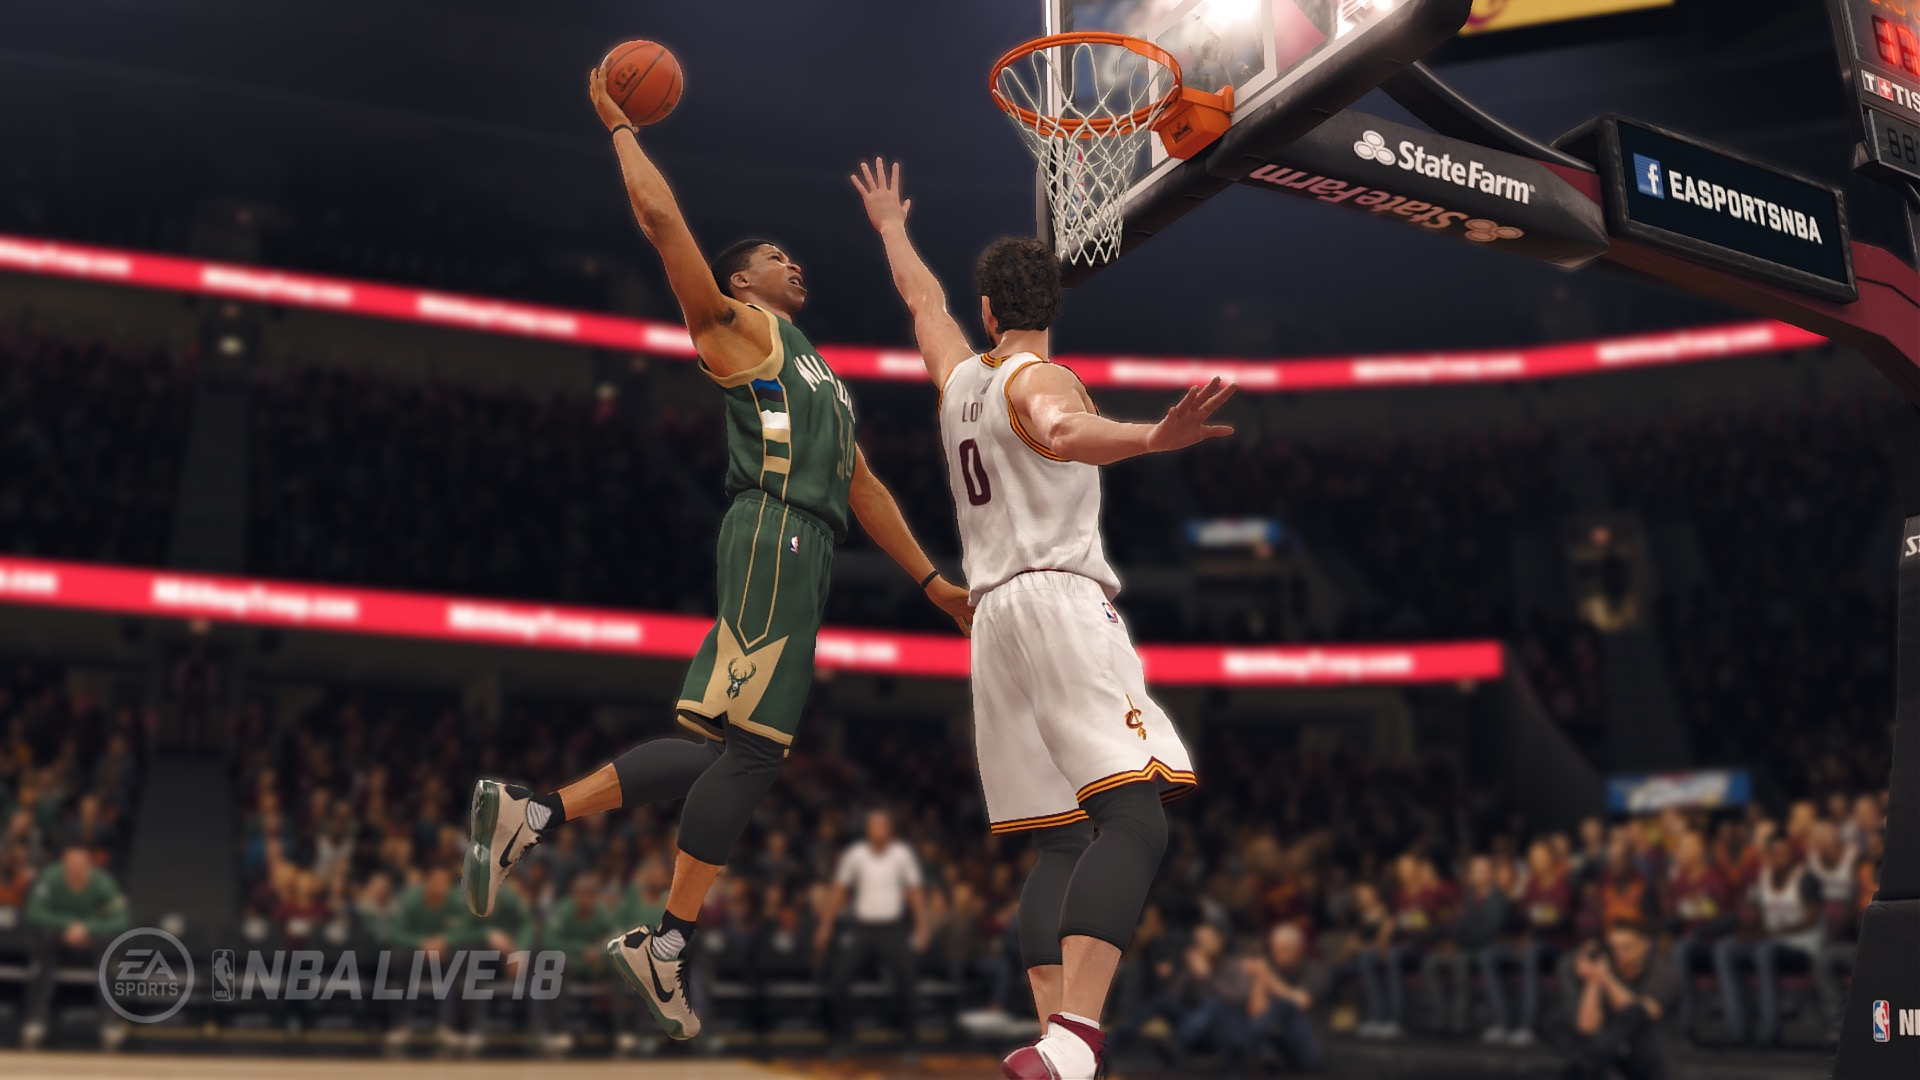 NBA Live 18 Basketball Wallpaper